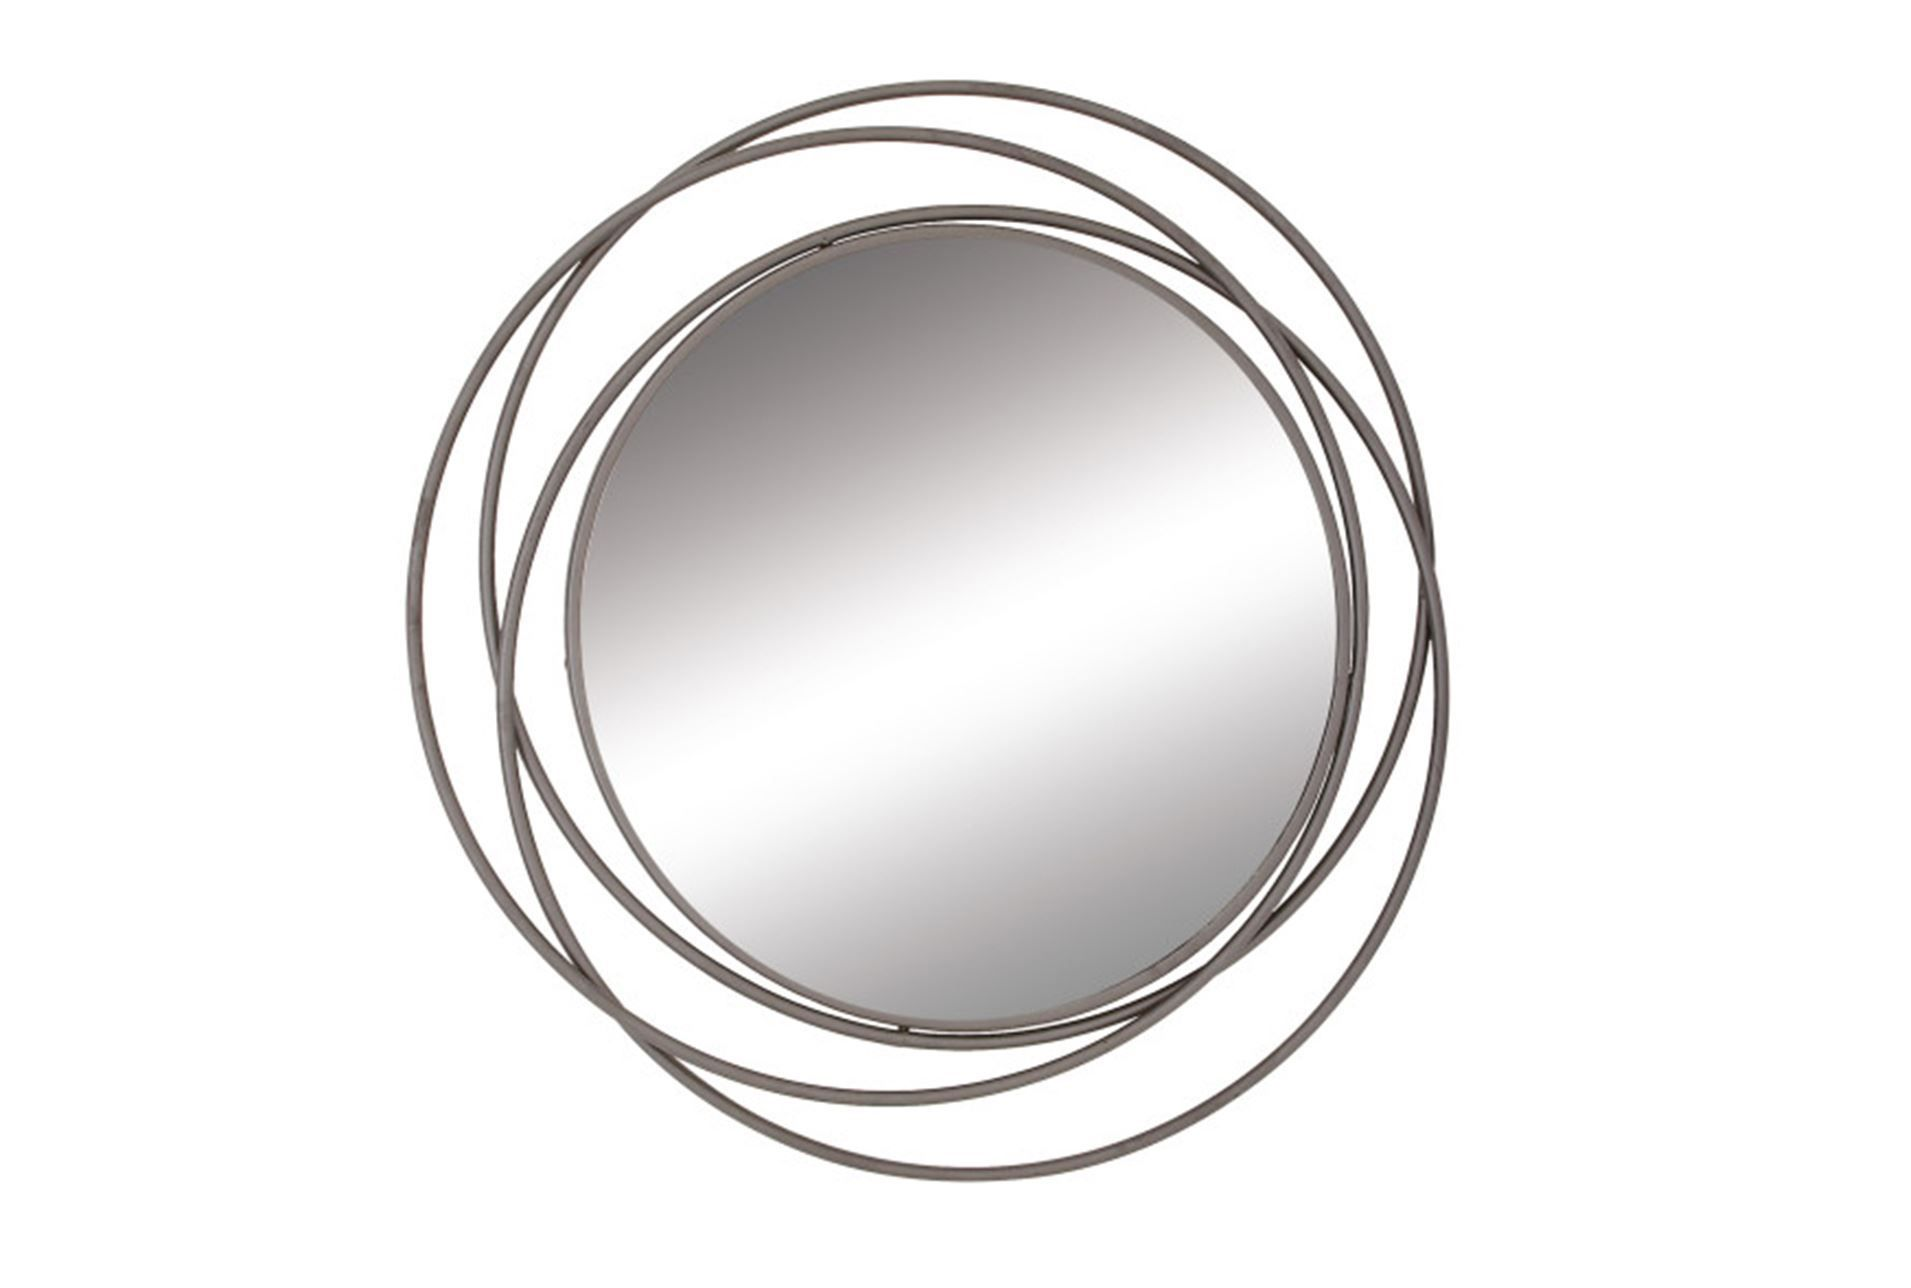 48 Inch 3 Ring Metal Wall Mirror Signature Mirror Wall Modern